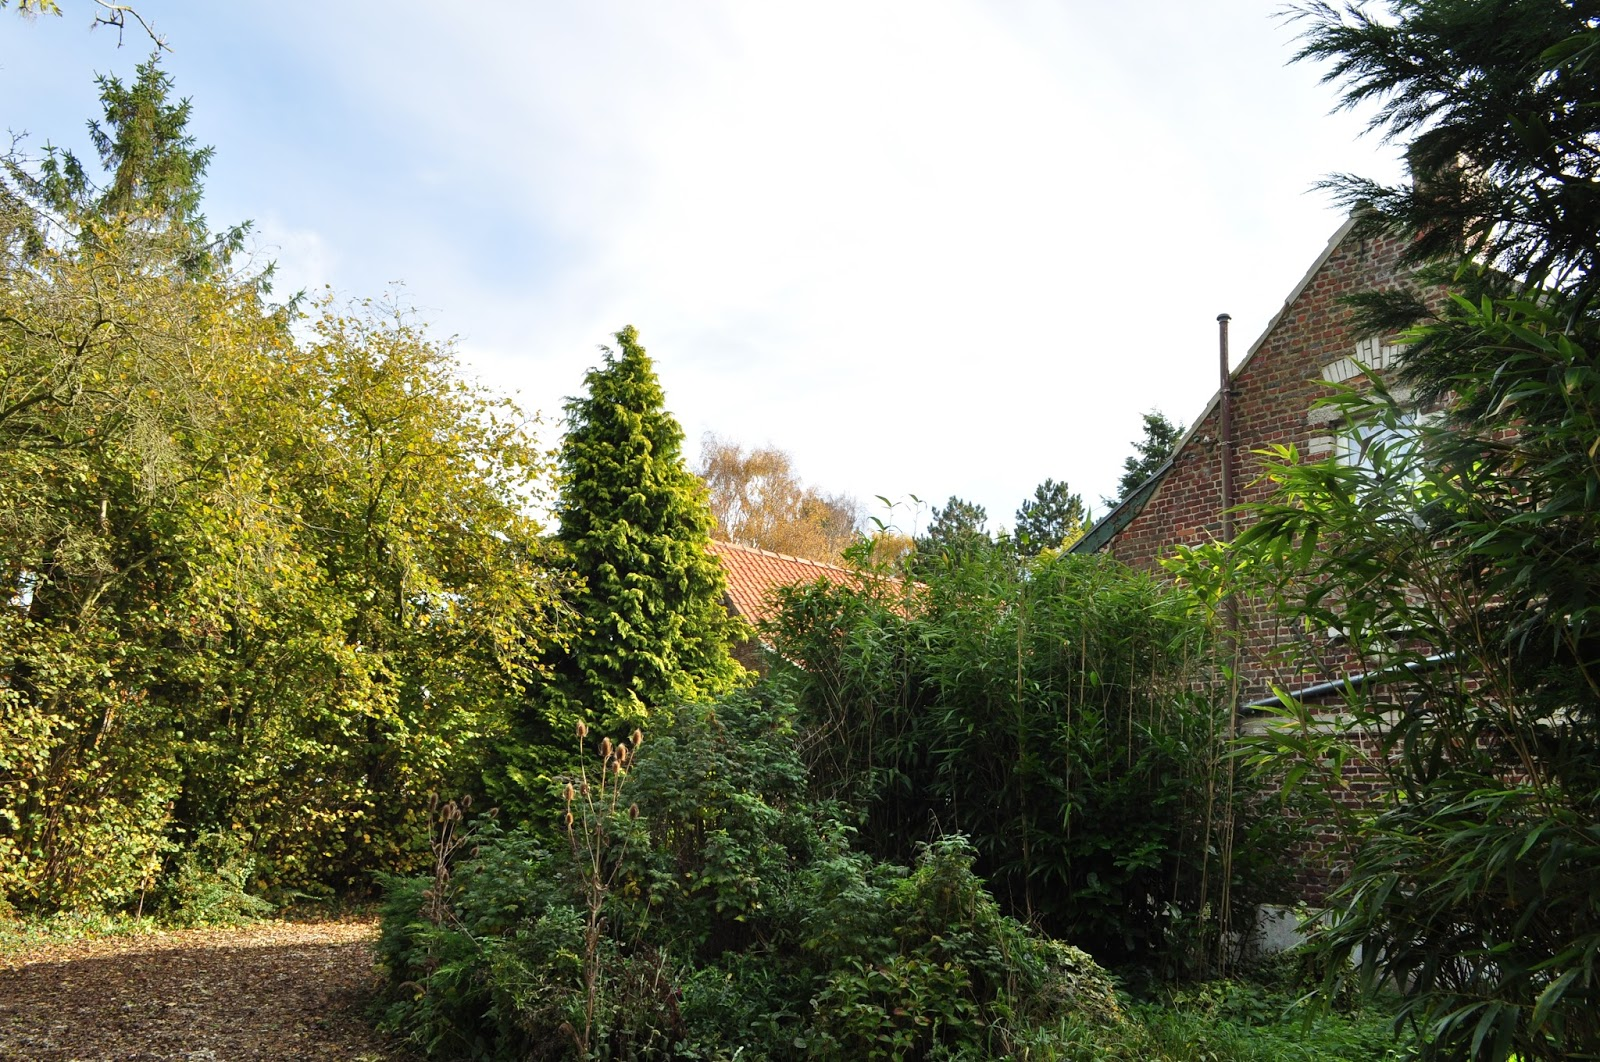 Jardin de la sauvagine 2017 octobre 2015 for Jardin lune octobre 2015